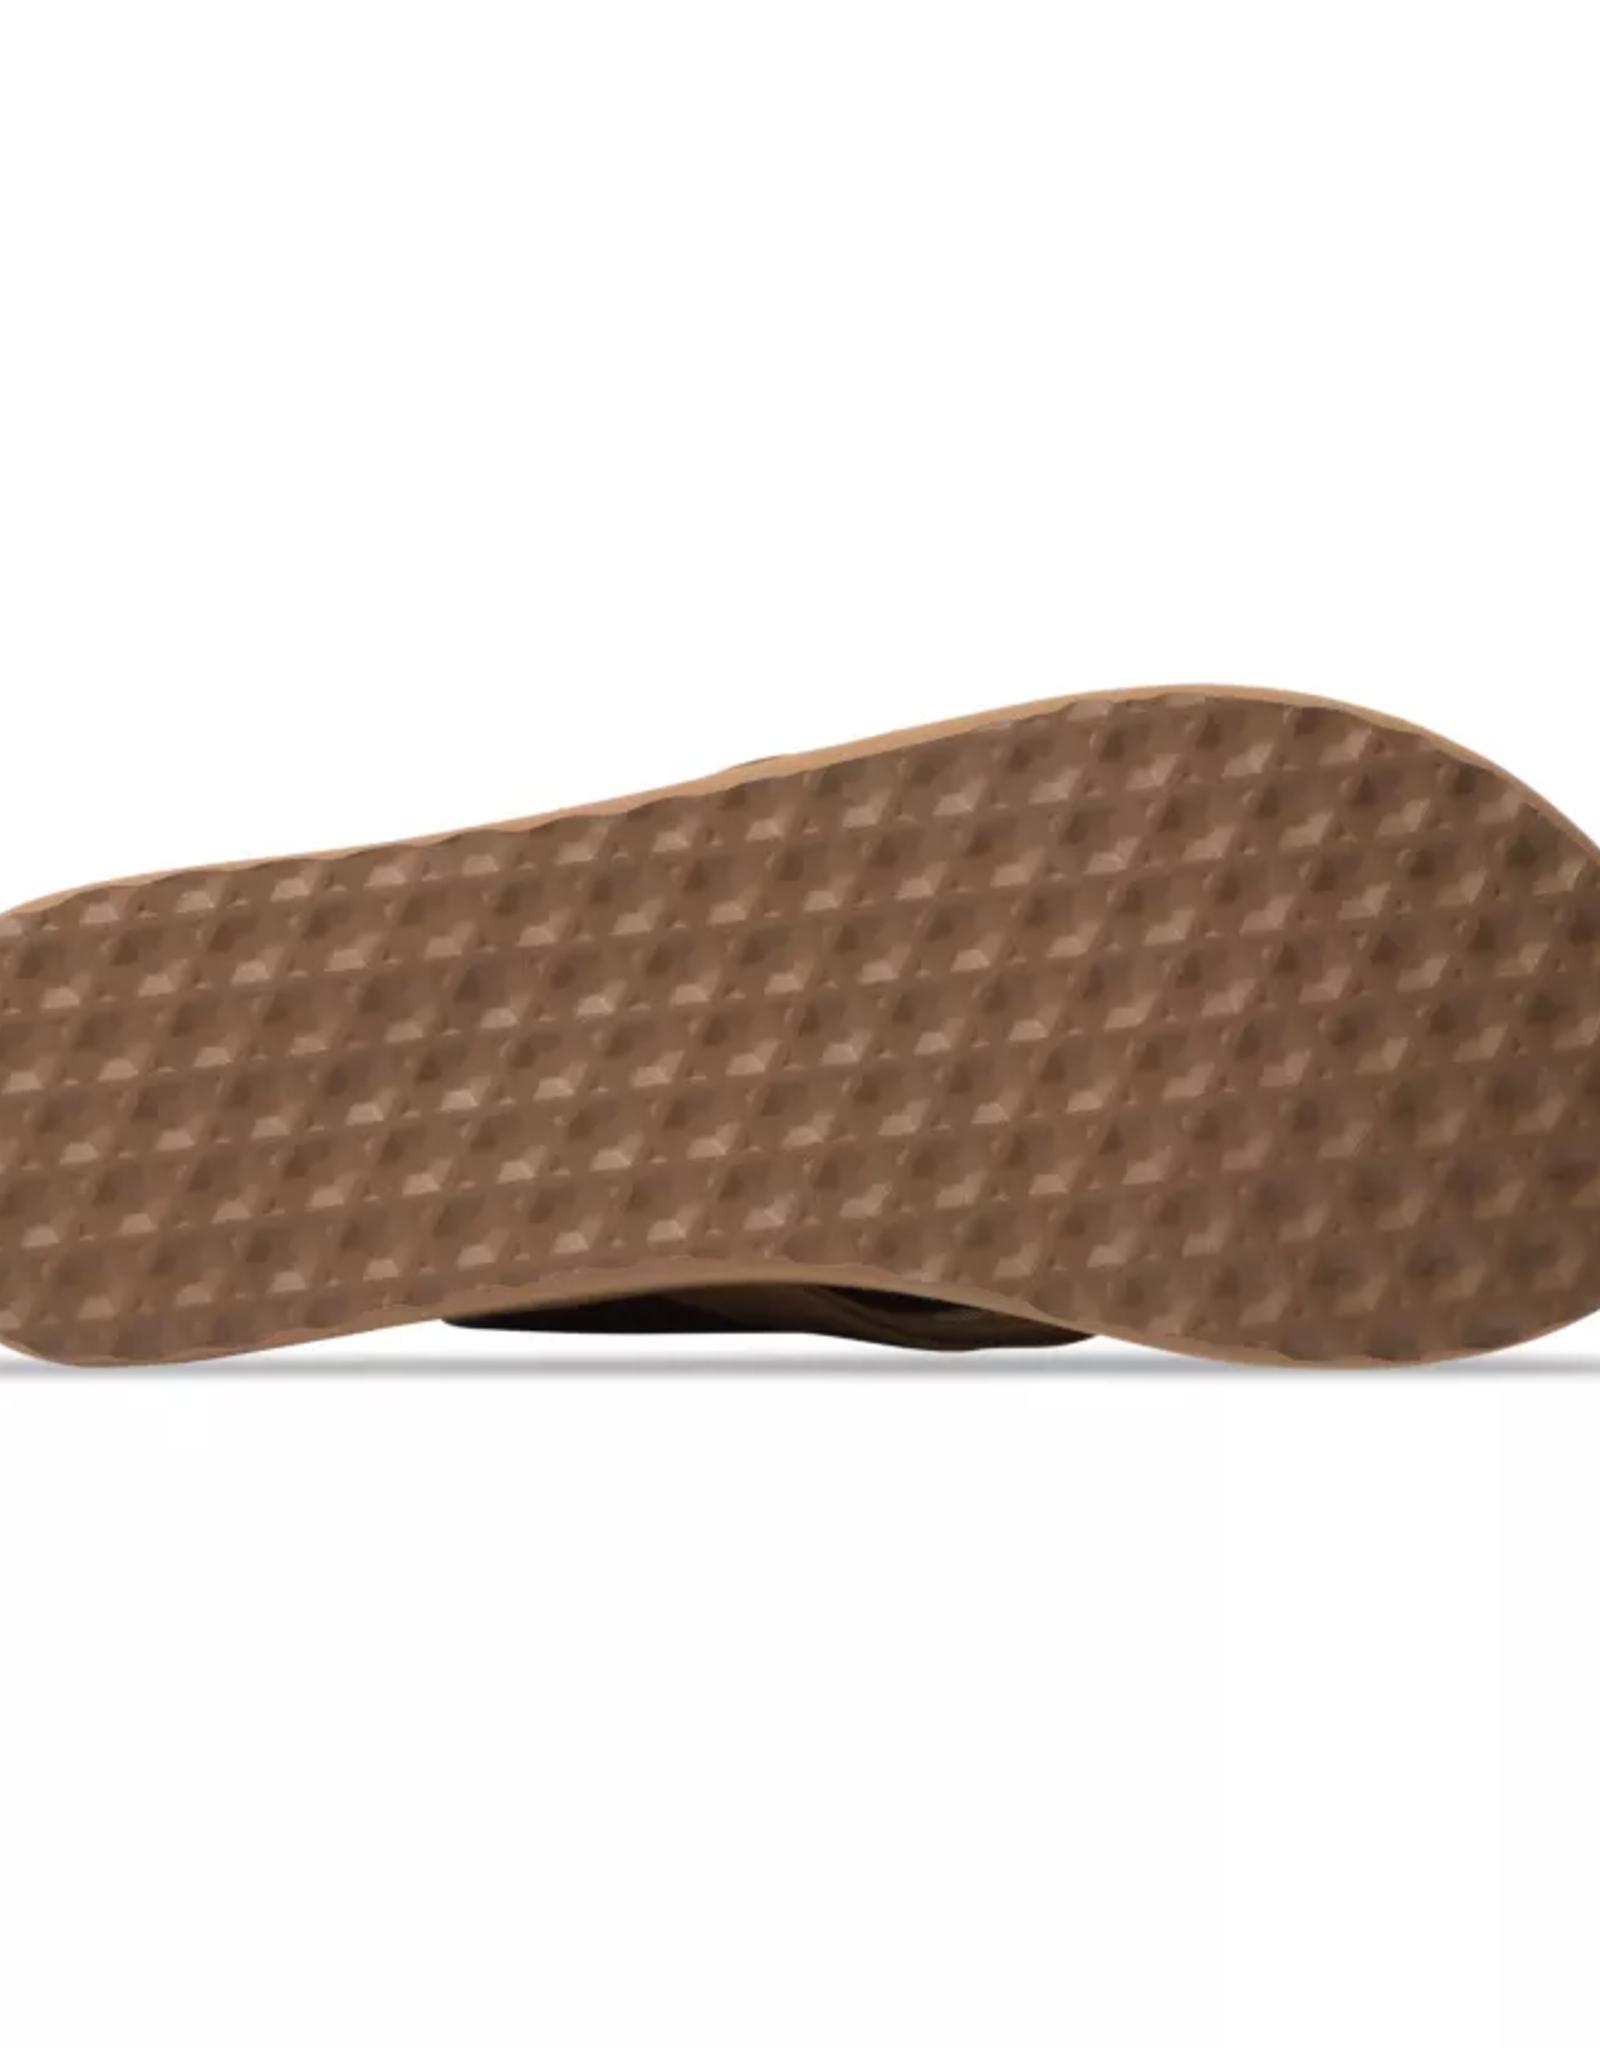 Vans W. Soft Top Sandal Chipmunk